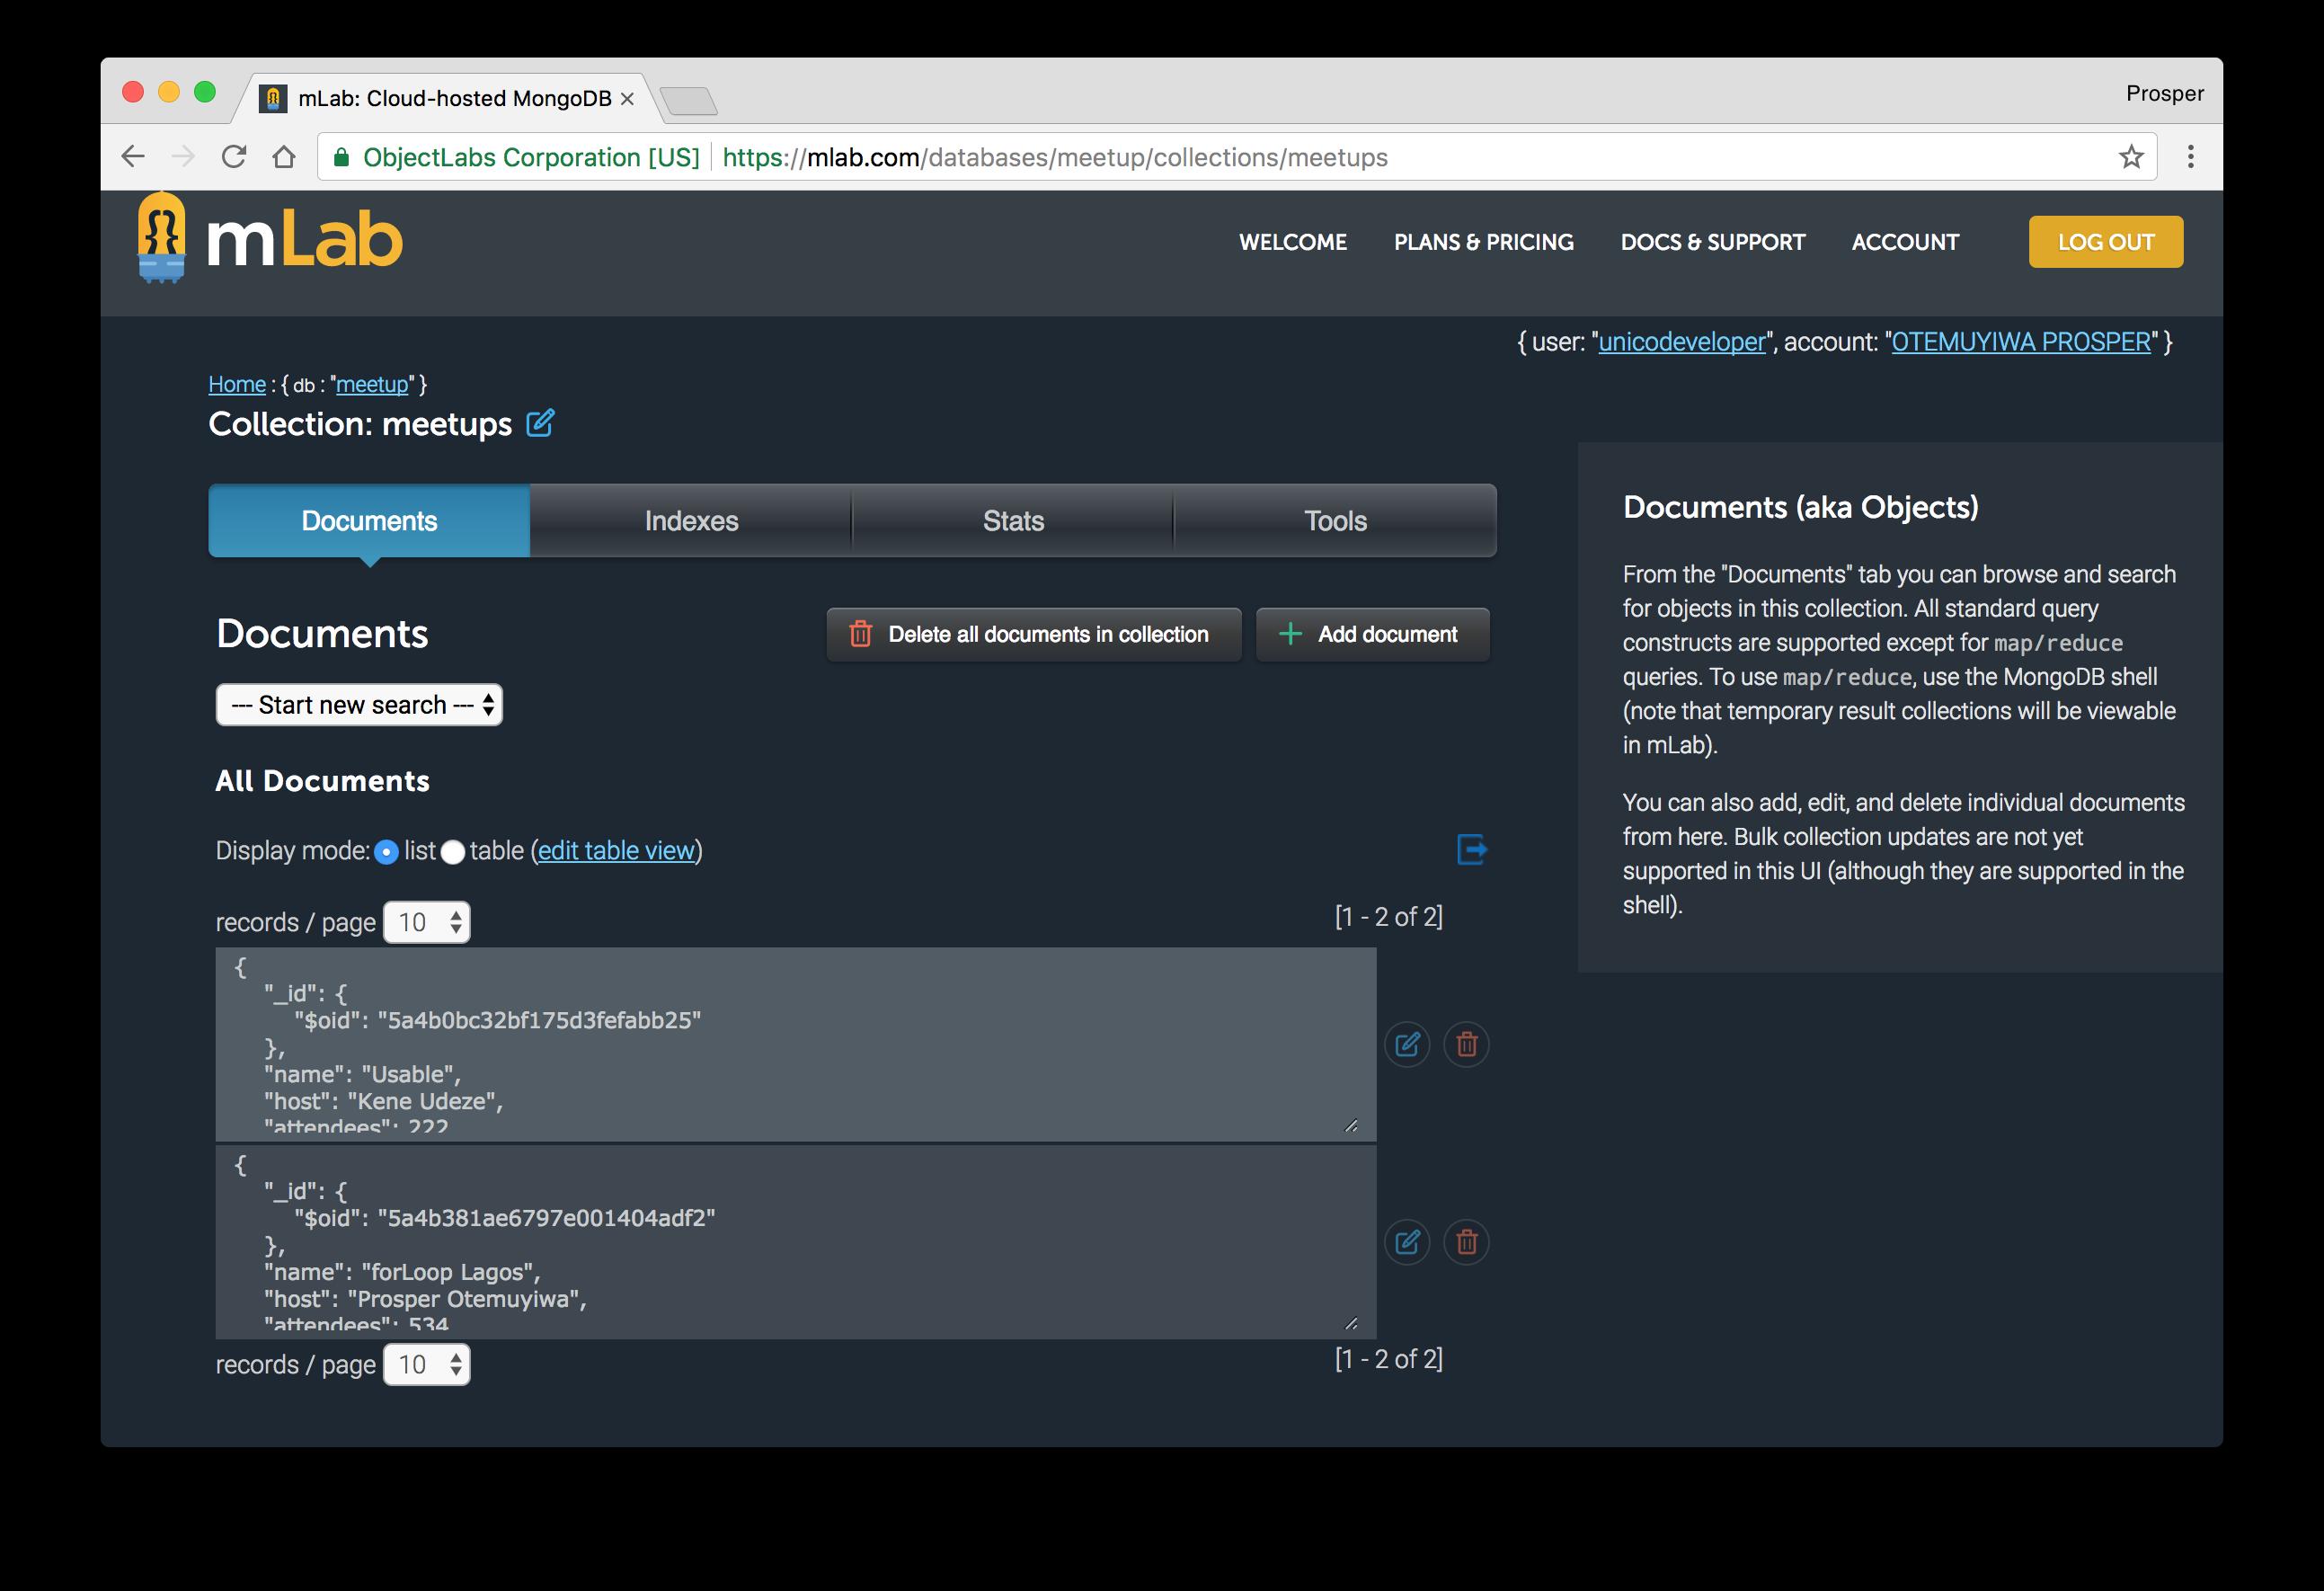 Database Snapshot